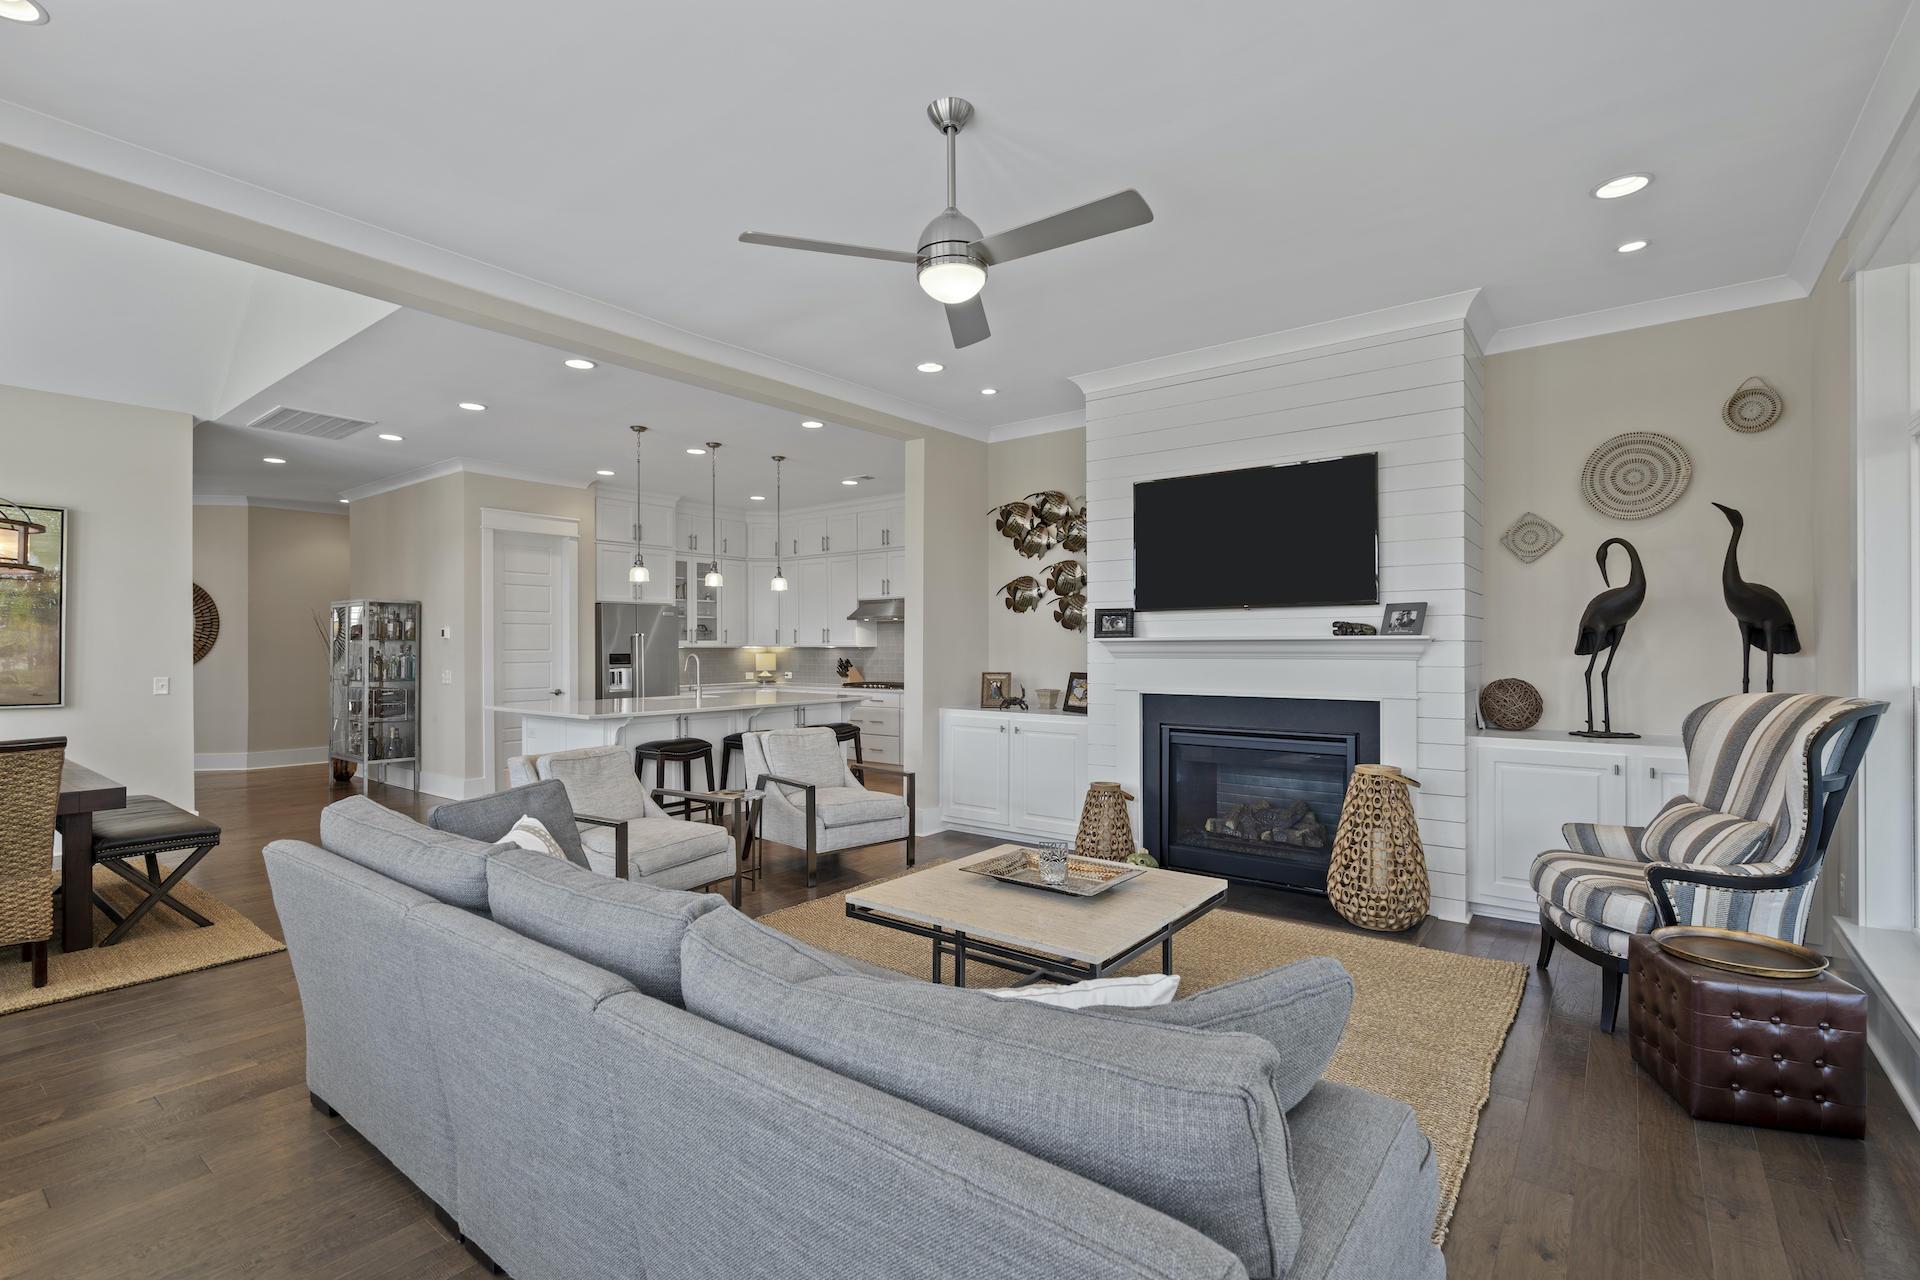 Dunes West Homes For Sale - 2316 Bucktail, Mount Pleasant, SC - 34